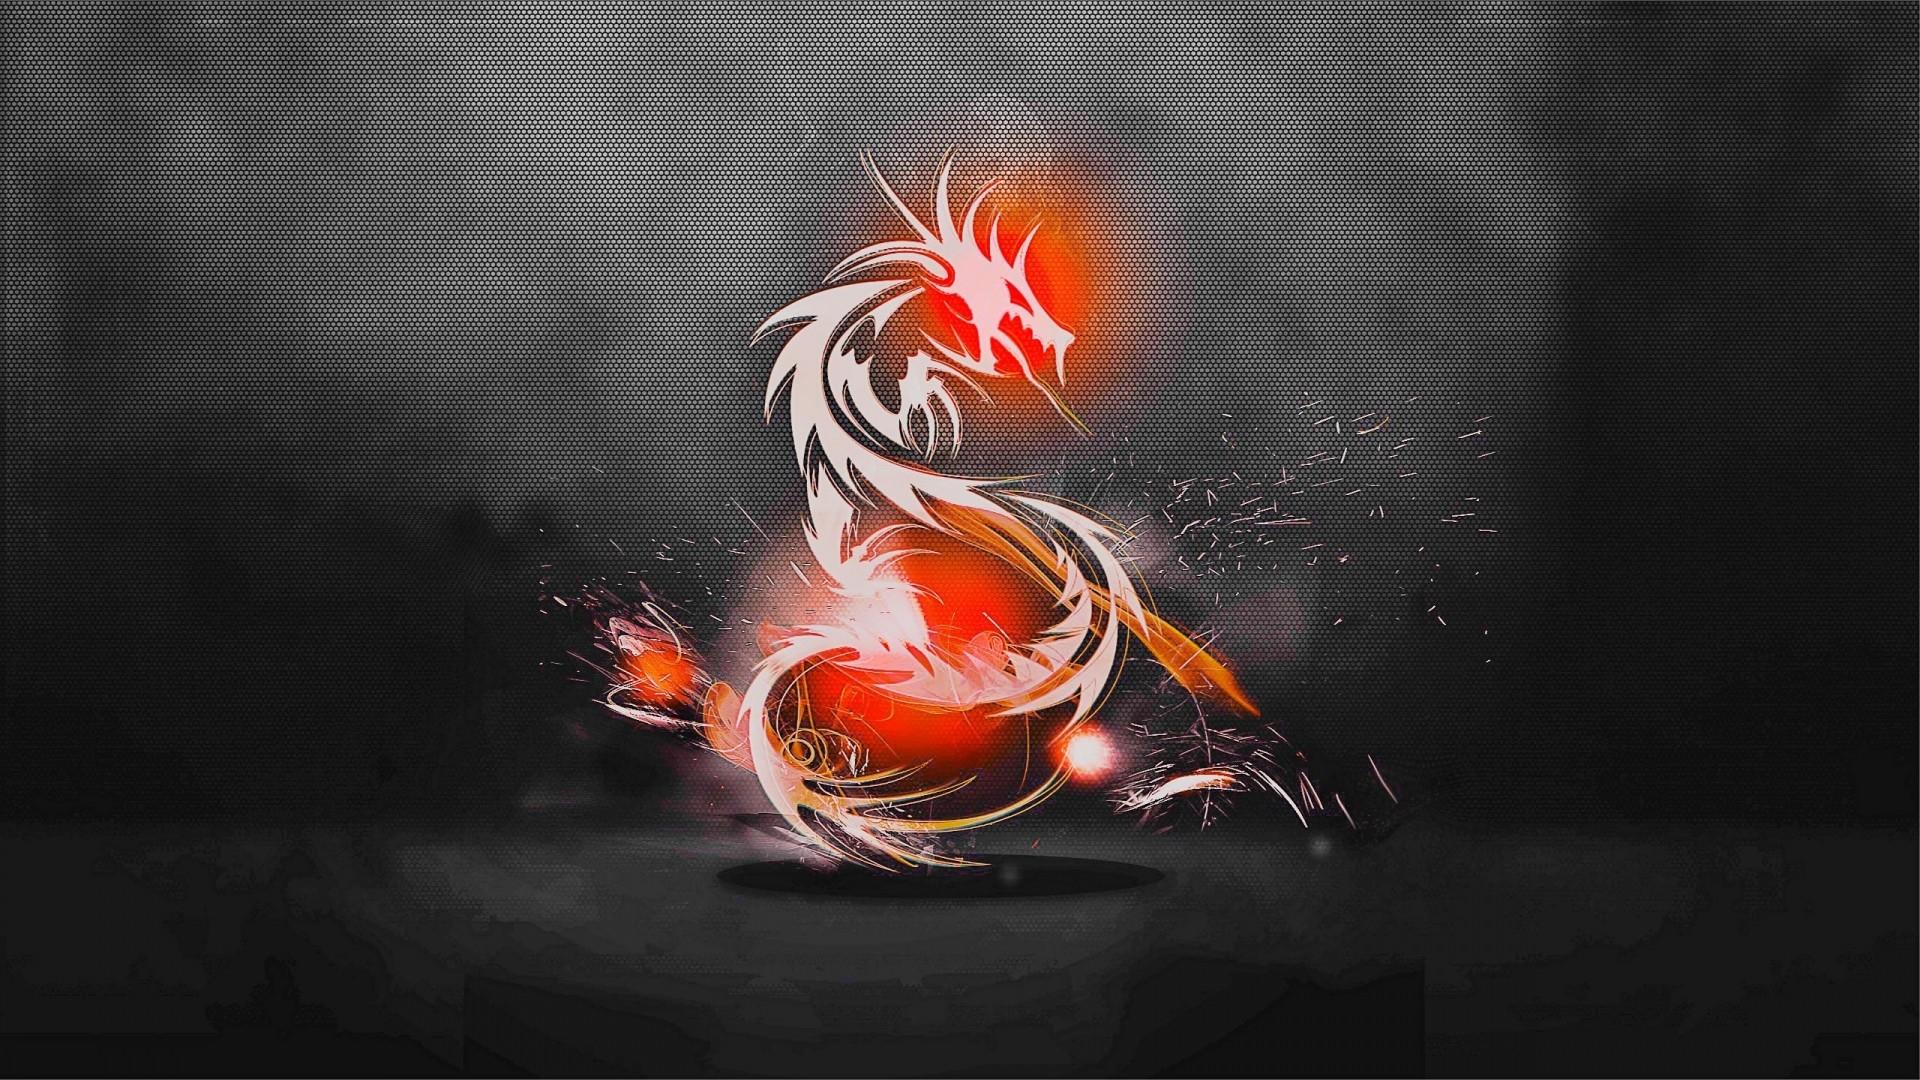 … Background Full HD 1080p. Wallpaper dragon, background,  light, shadow